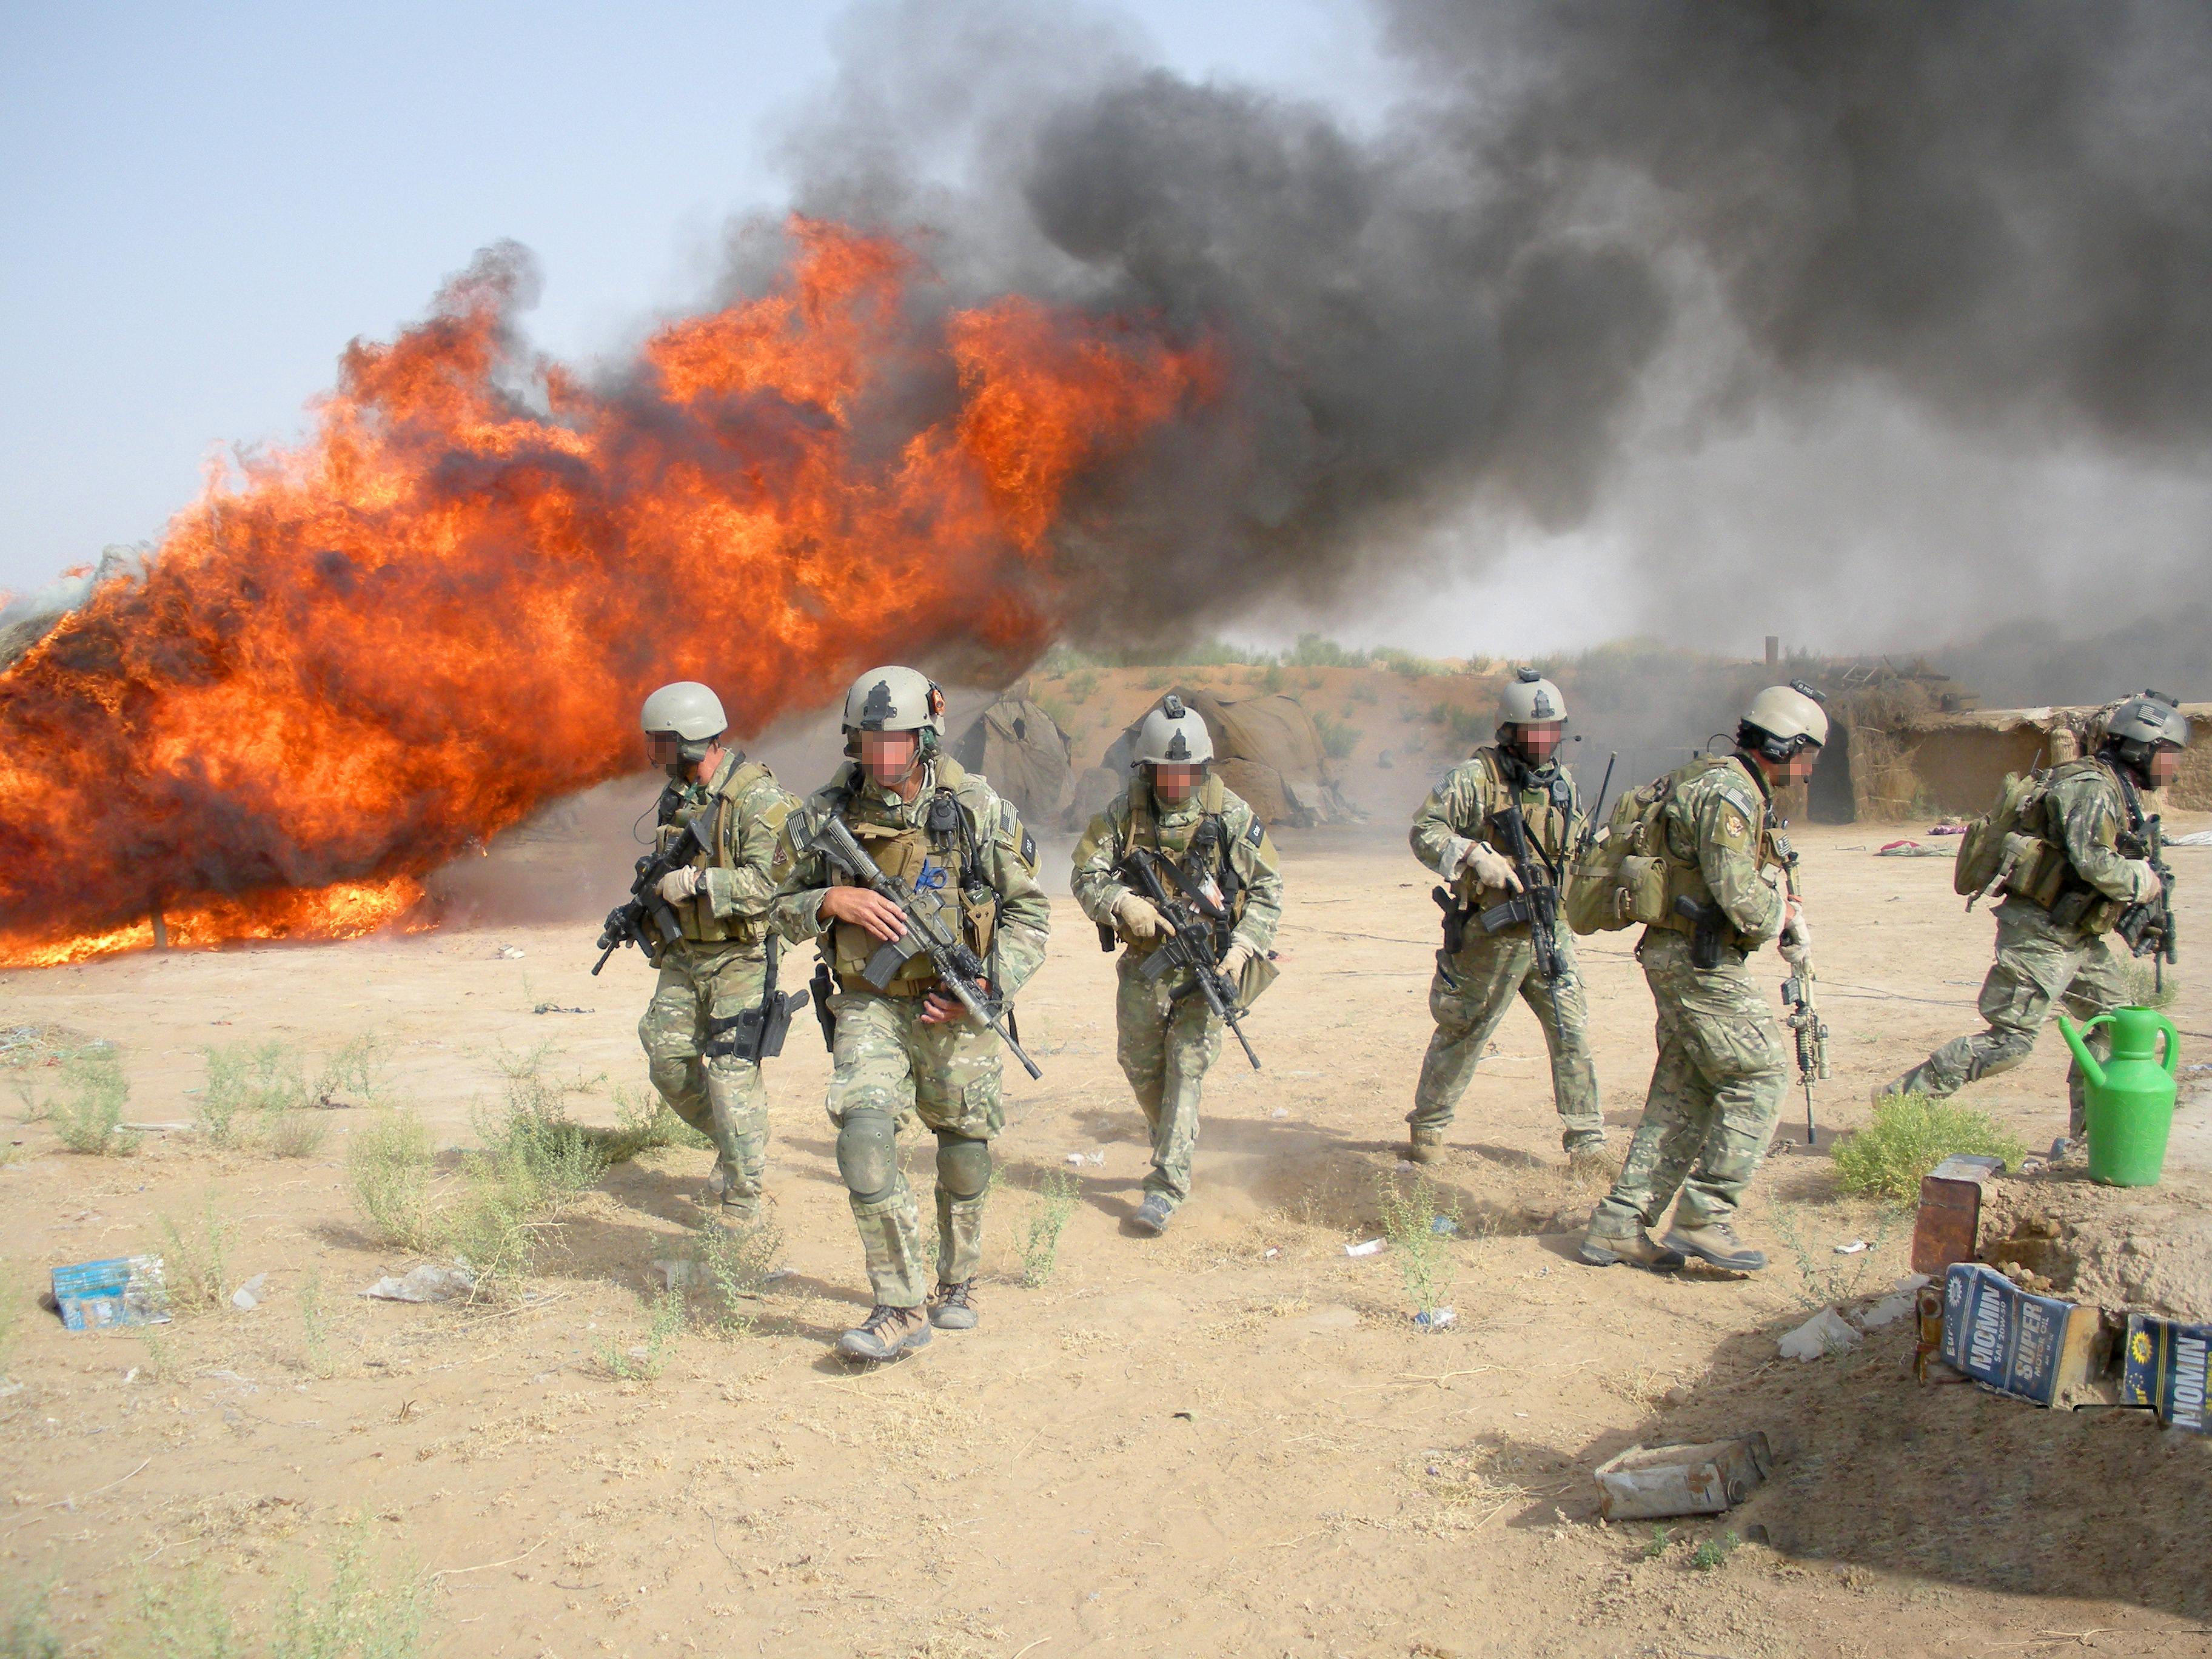 File:Burning hashish seized in Operation Albatross.jpg - Wikimedia Commons